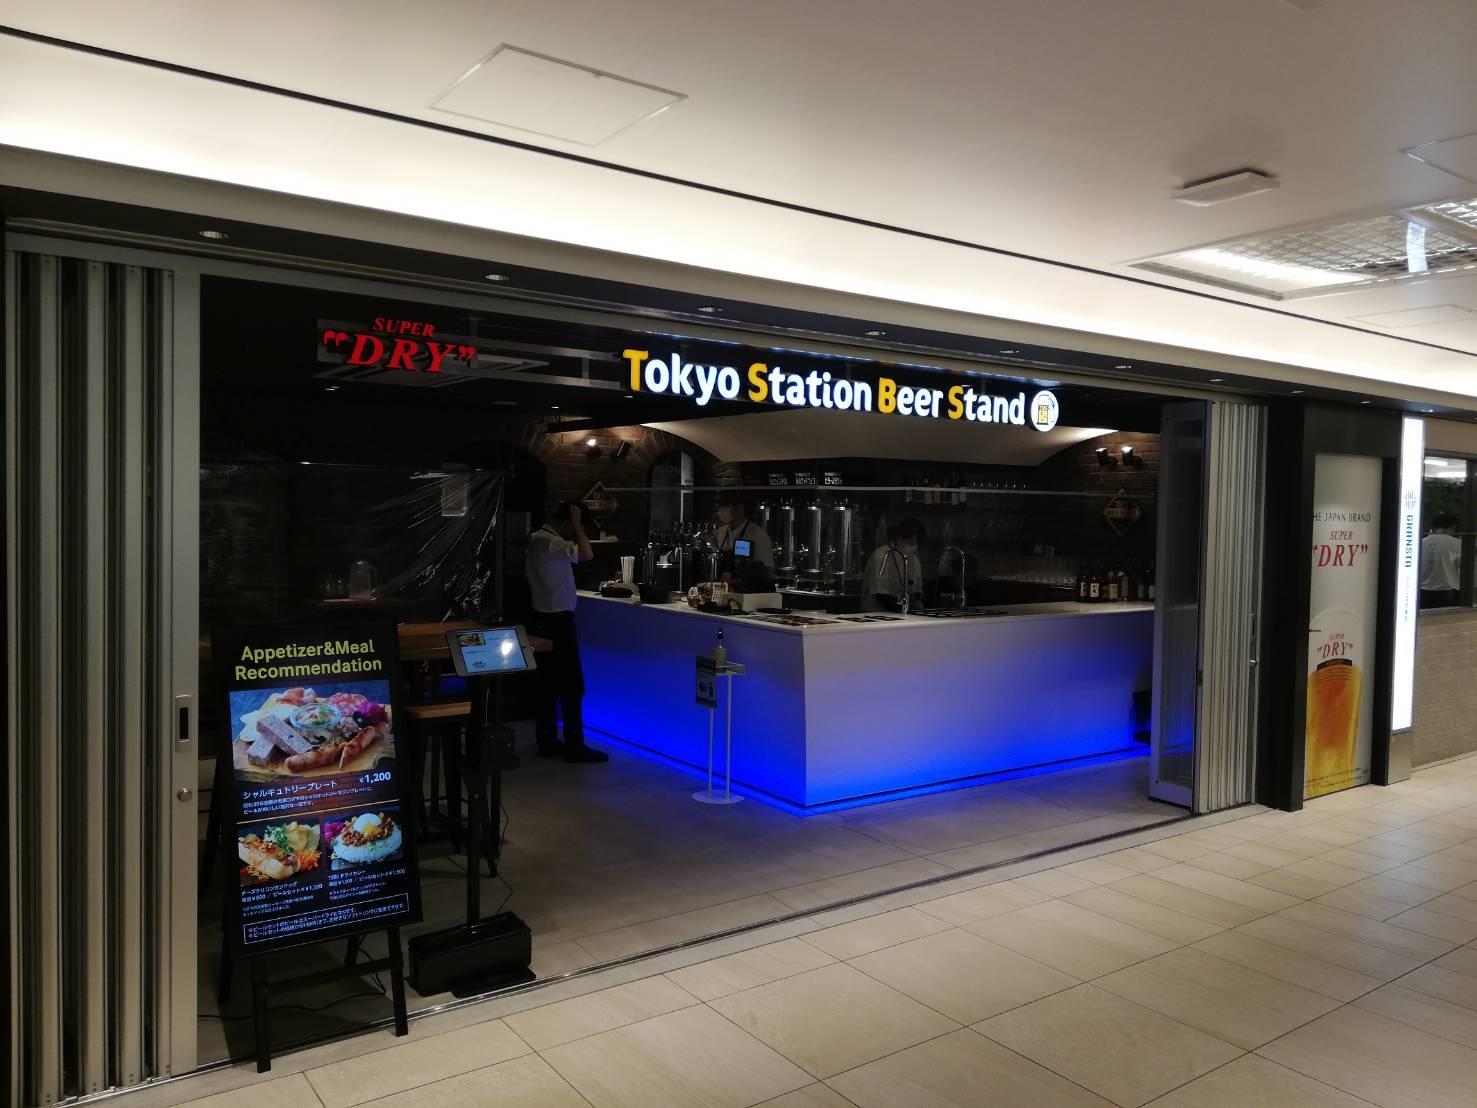 Tokyo Station Beer Stand